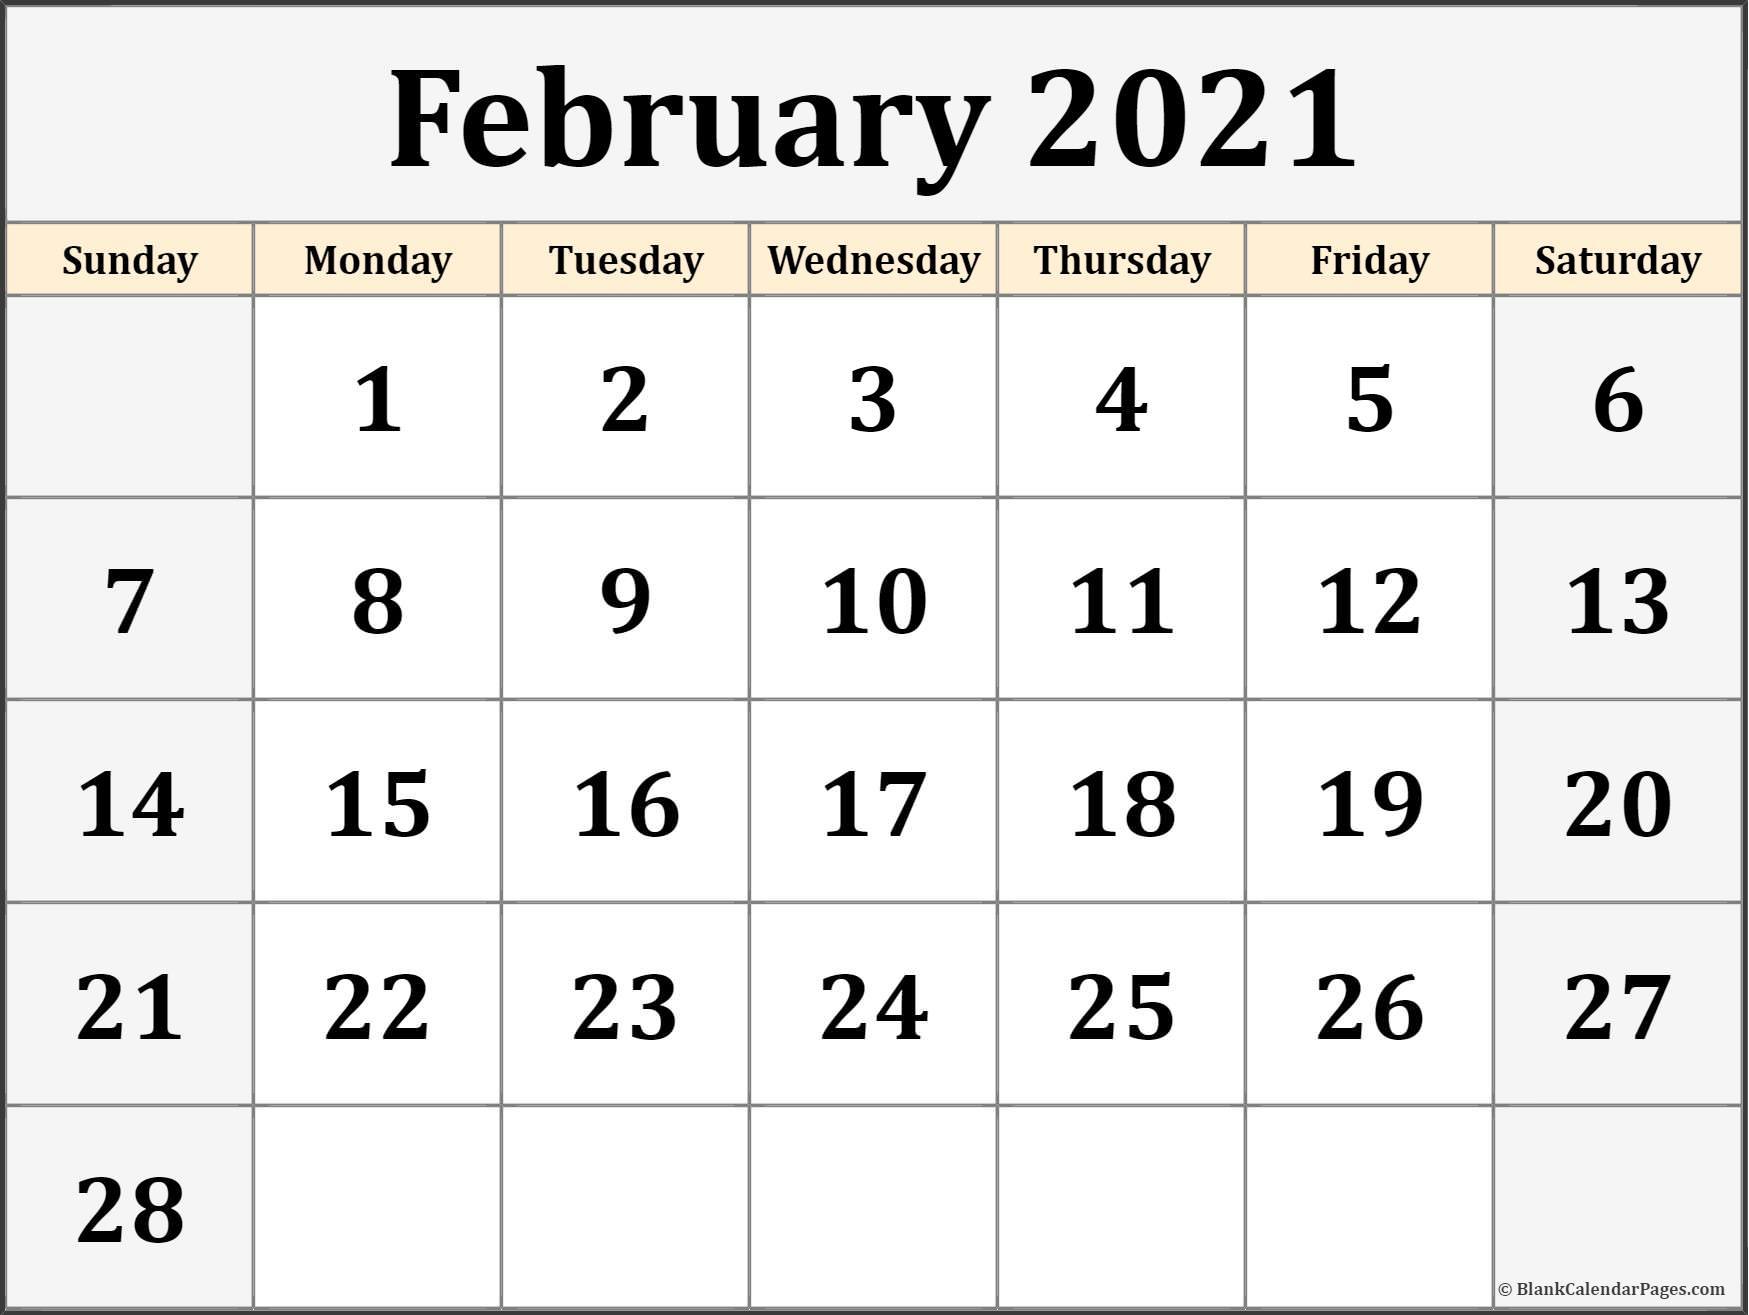 Free Calendars 2021 Printable | Calendar Printables Free Blank throughout Blank Monthly Calendar 2021